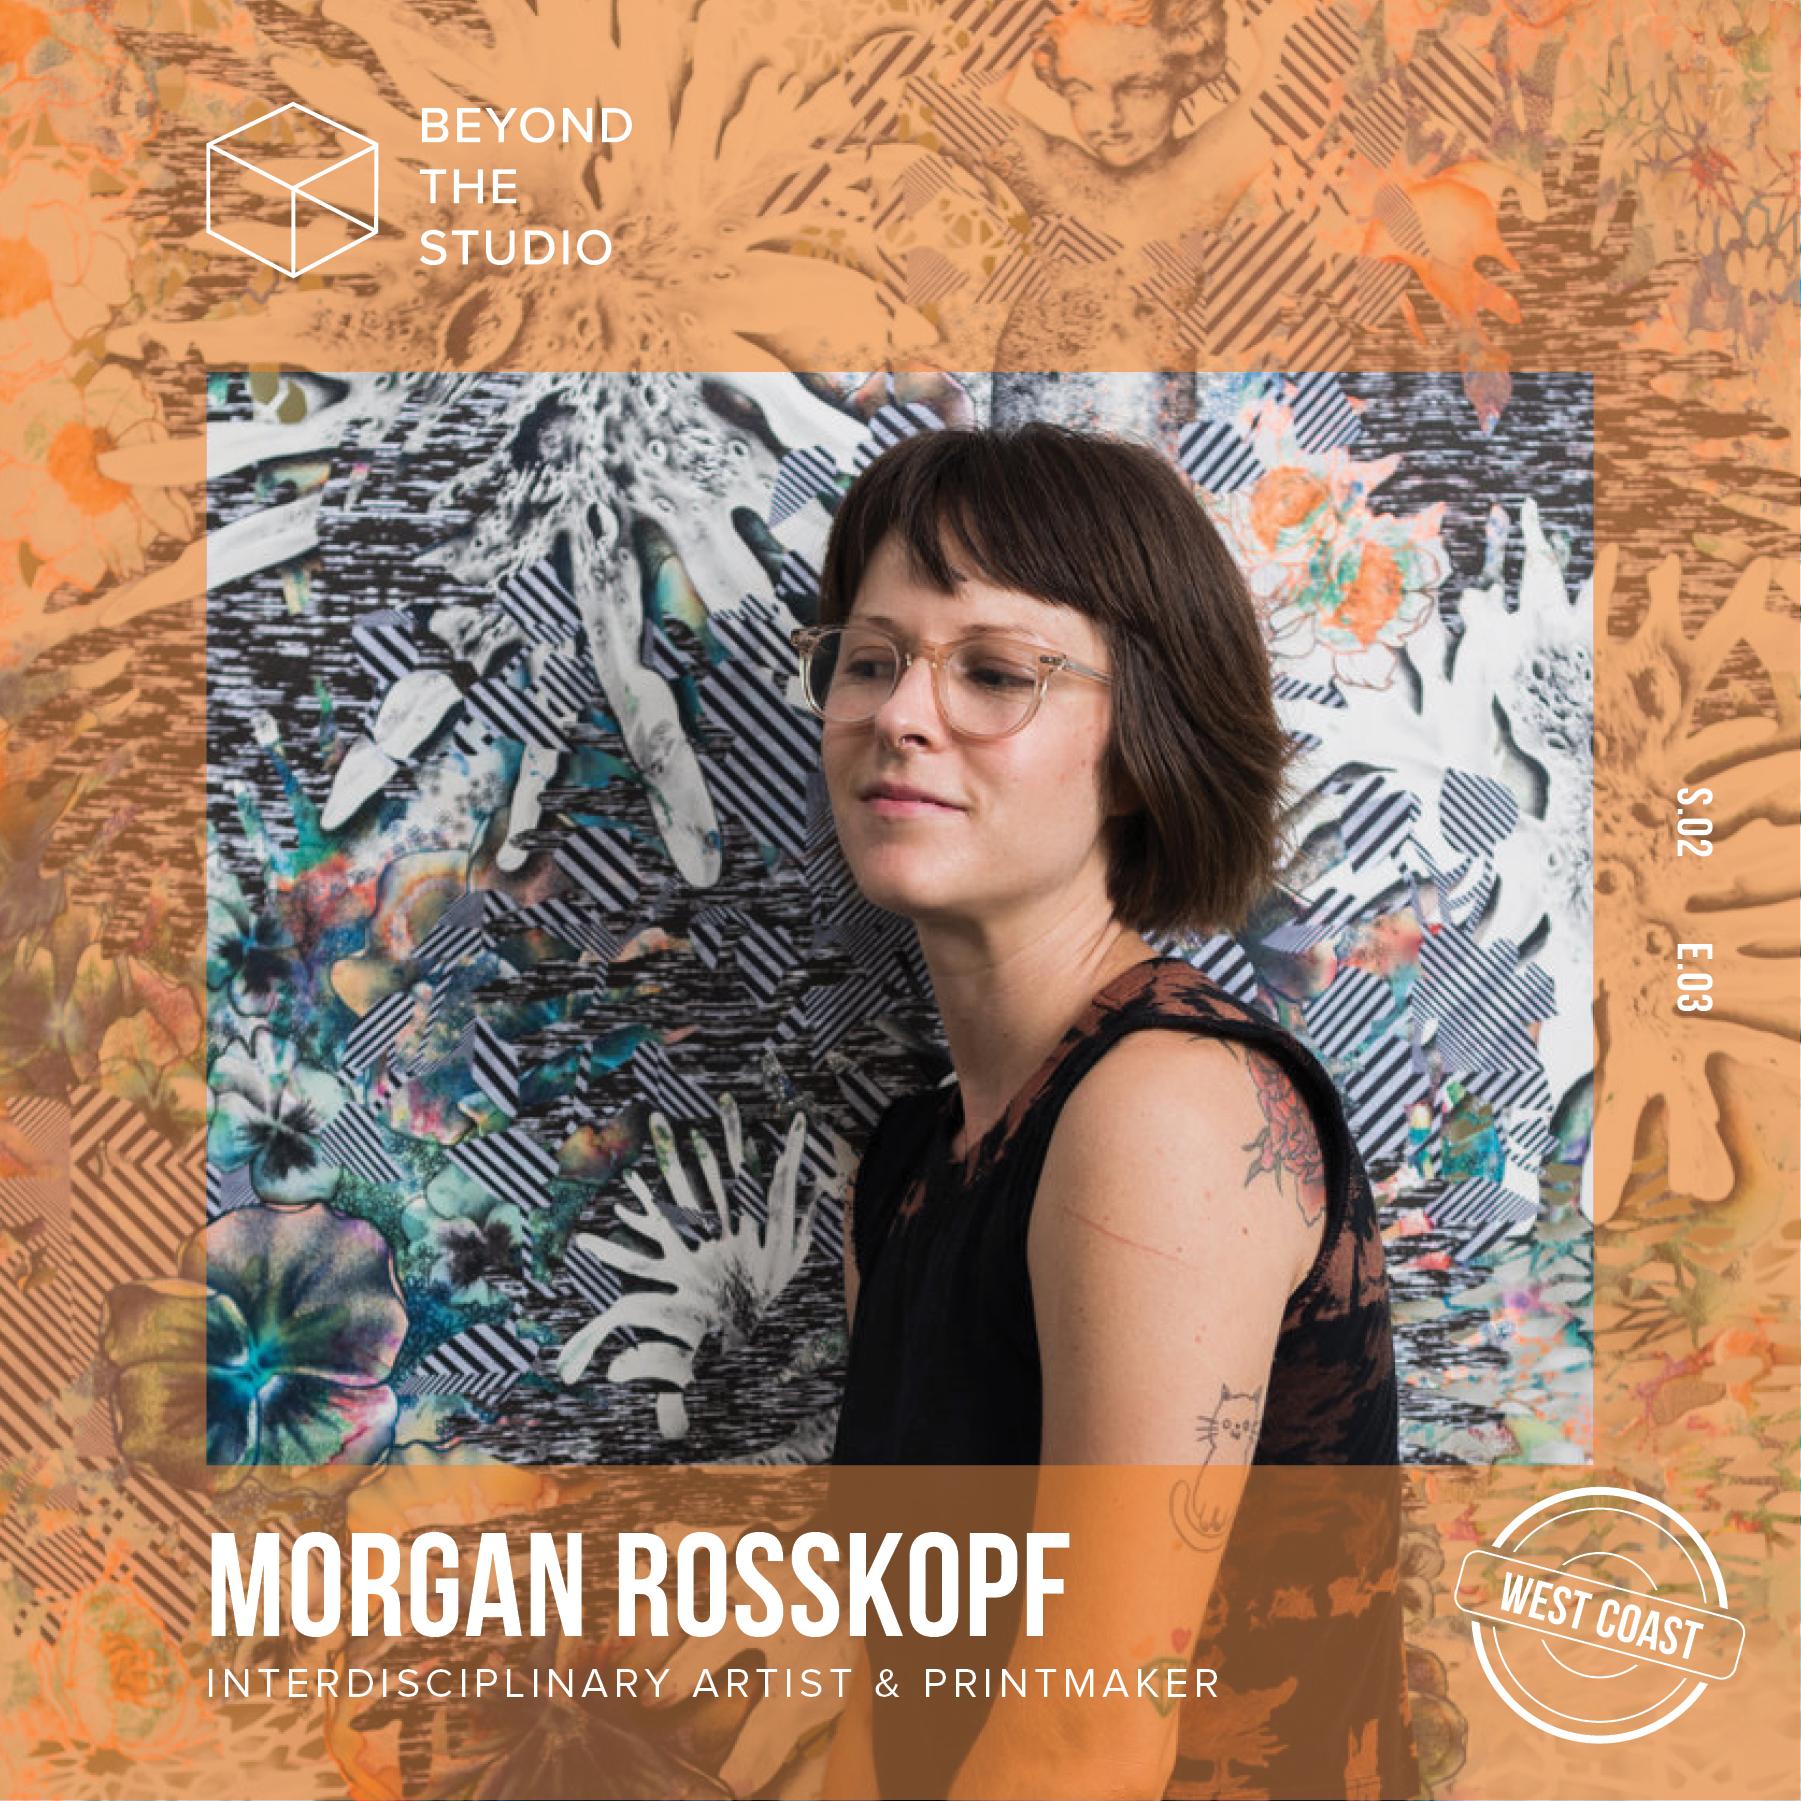 AnnouncementImage_MorganRosskopf.jpg